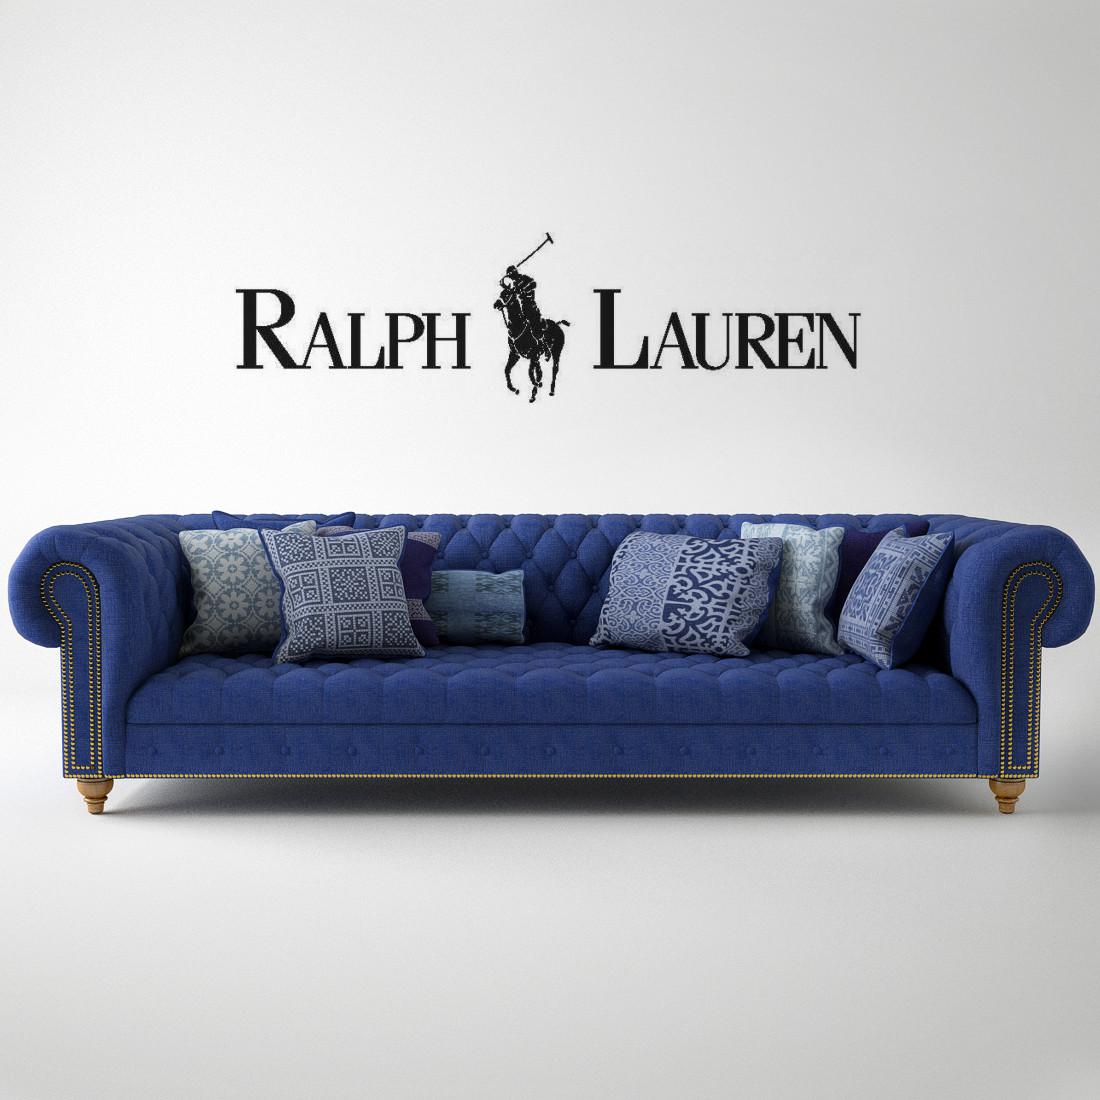 ralph lauren home chesterfield sofa cream corner chaise 3d max gtr 35 prototyping